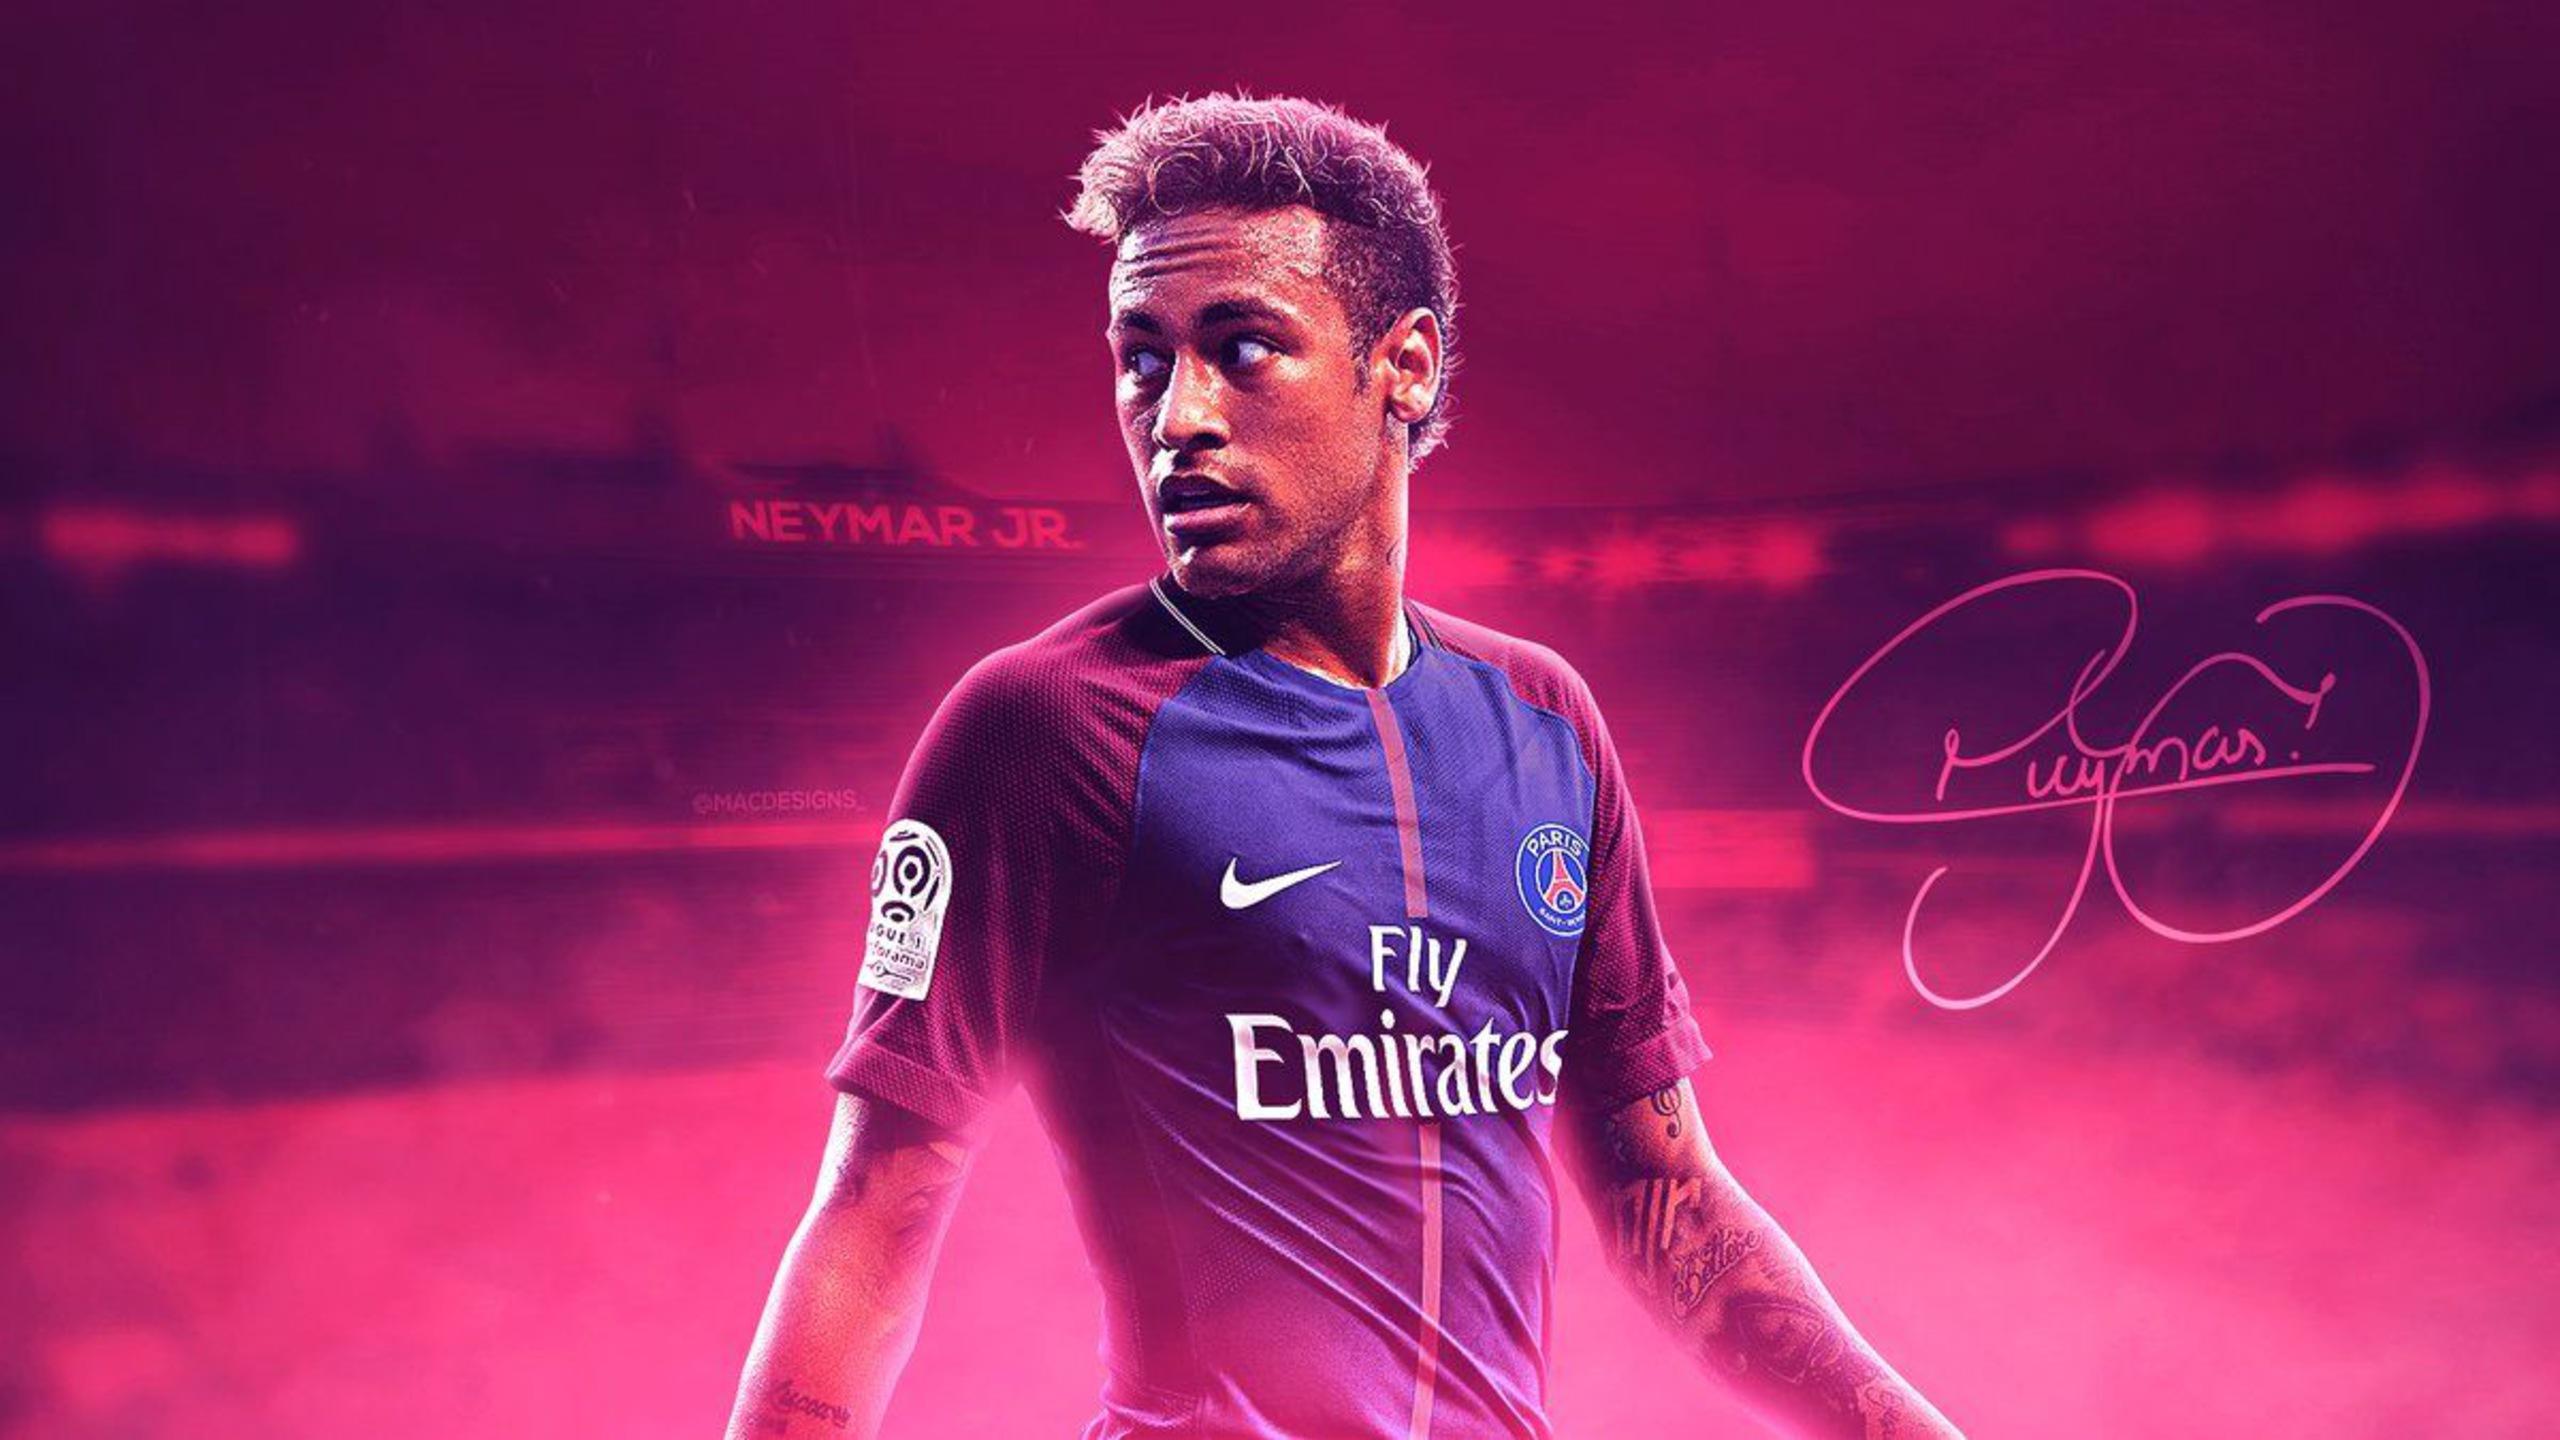 Neymar tidak mungkin meninggalkan PSG